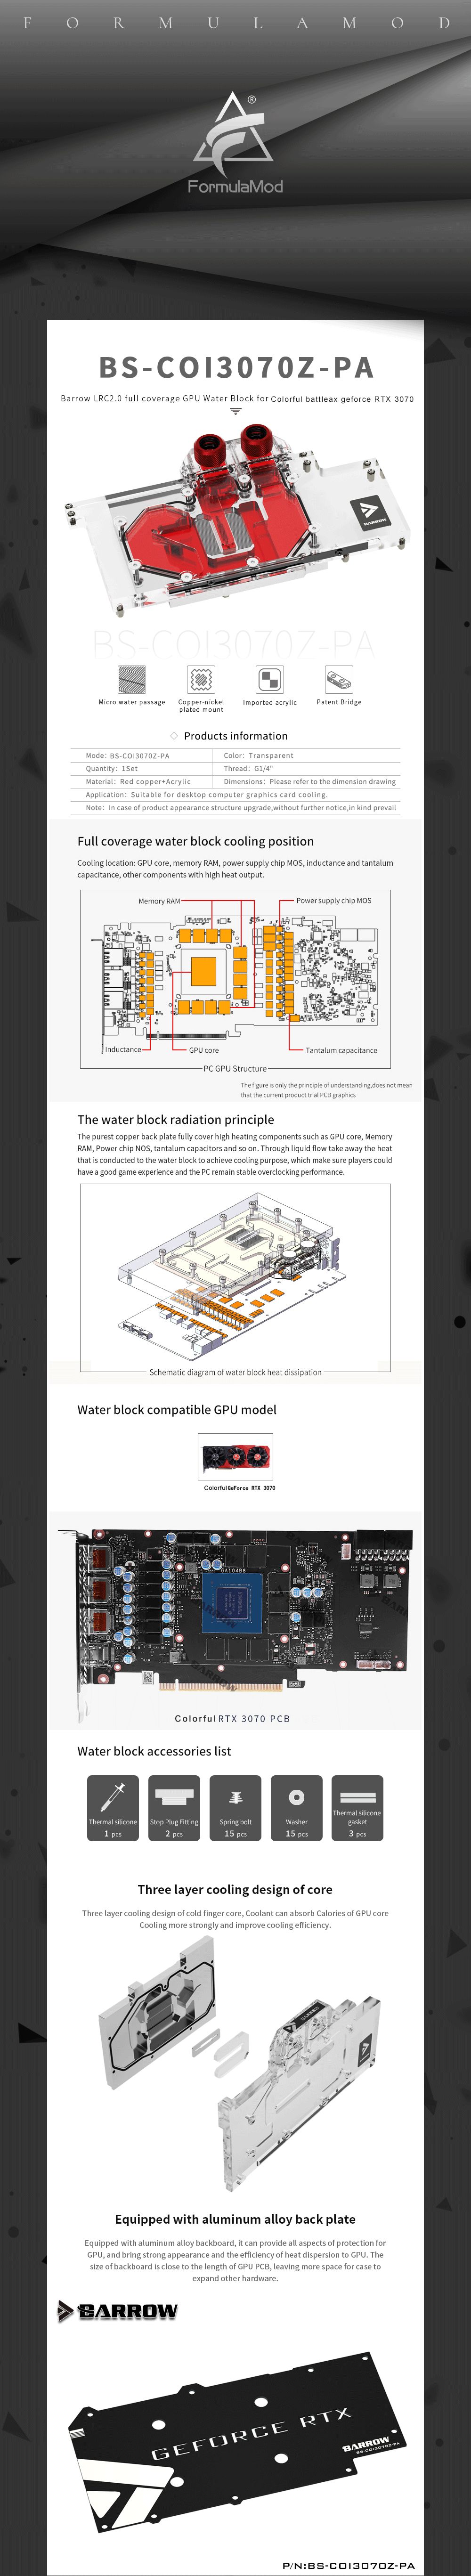 Barrow 3070 GPU Water Block for COLORFUL Battle-AX RTX 3070, Full Cover ARGB GPU Cooler, BS-COI3070Z-PA